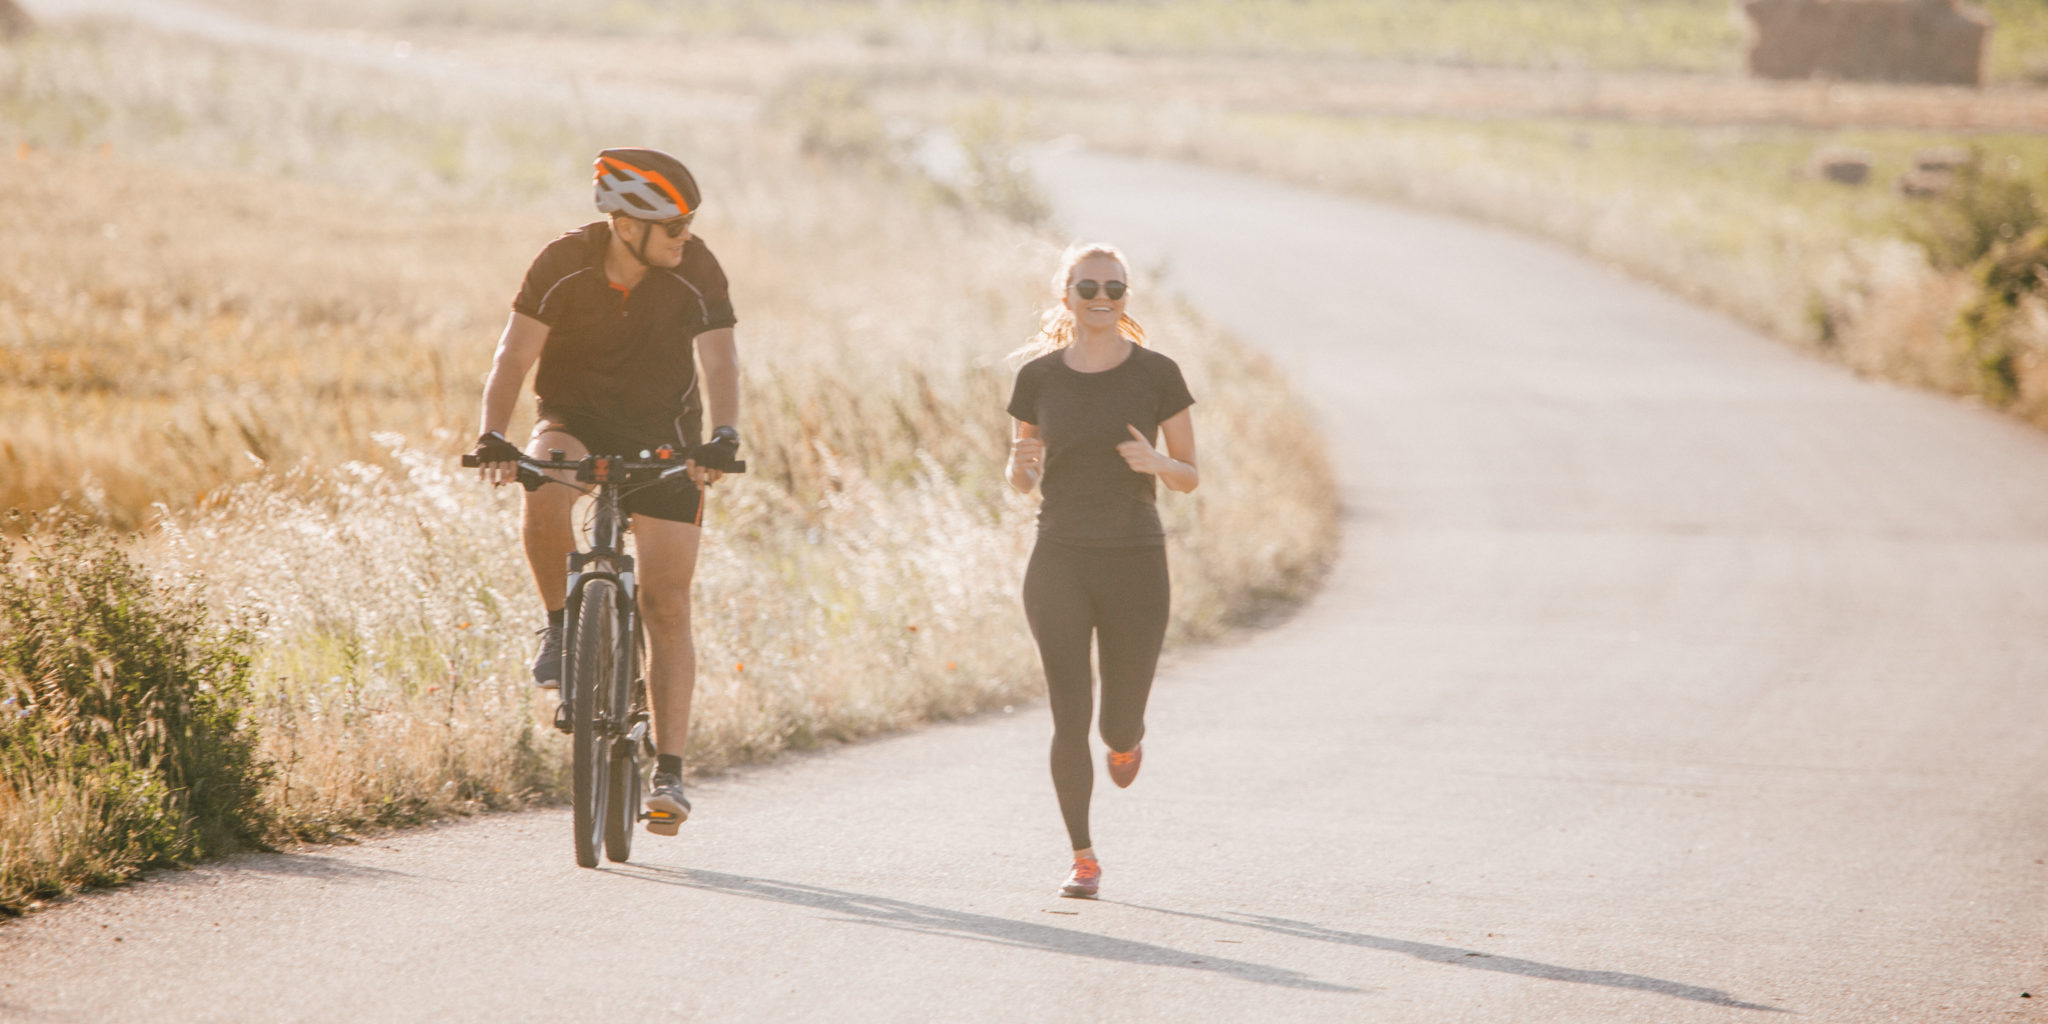 workout social distancing - biking and running